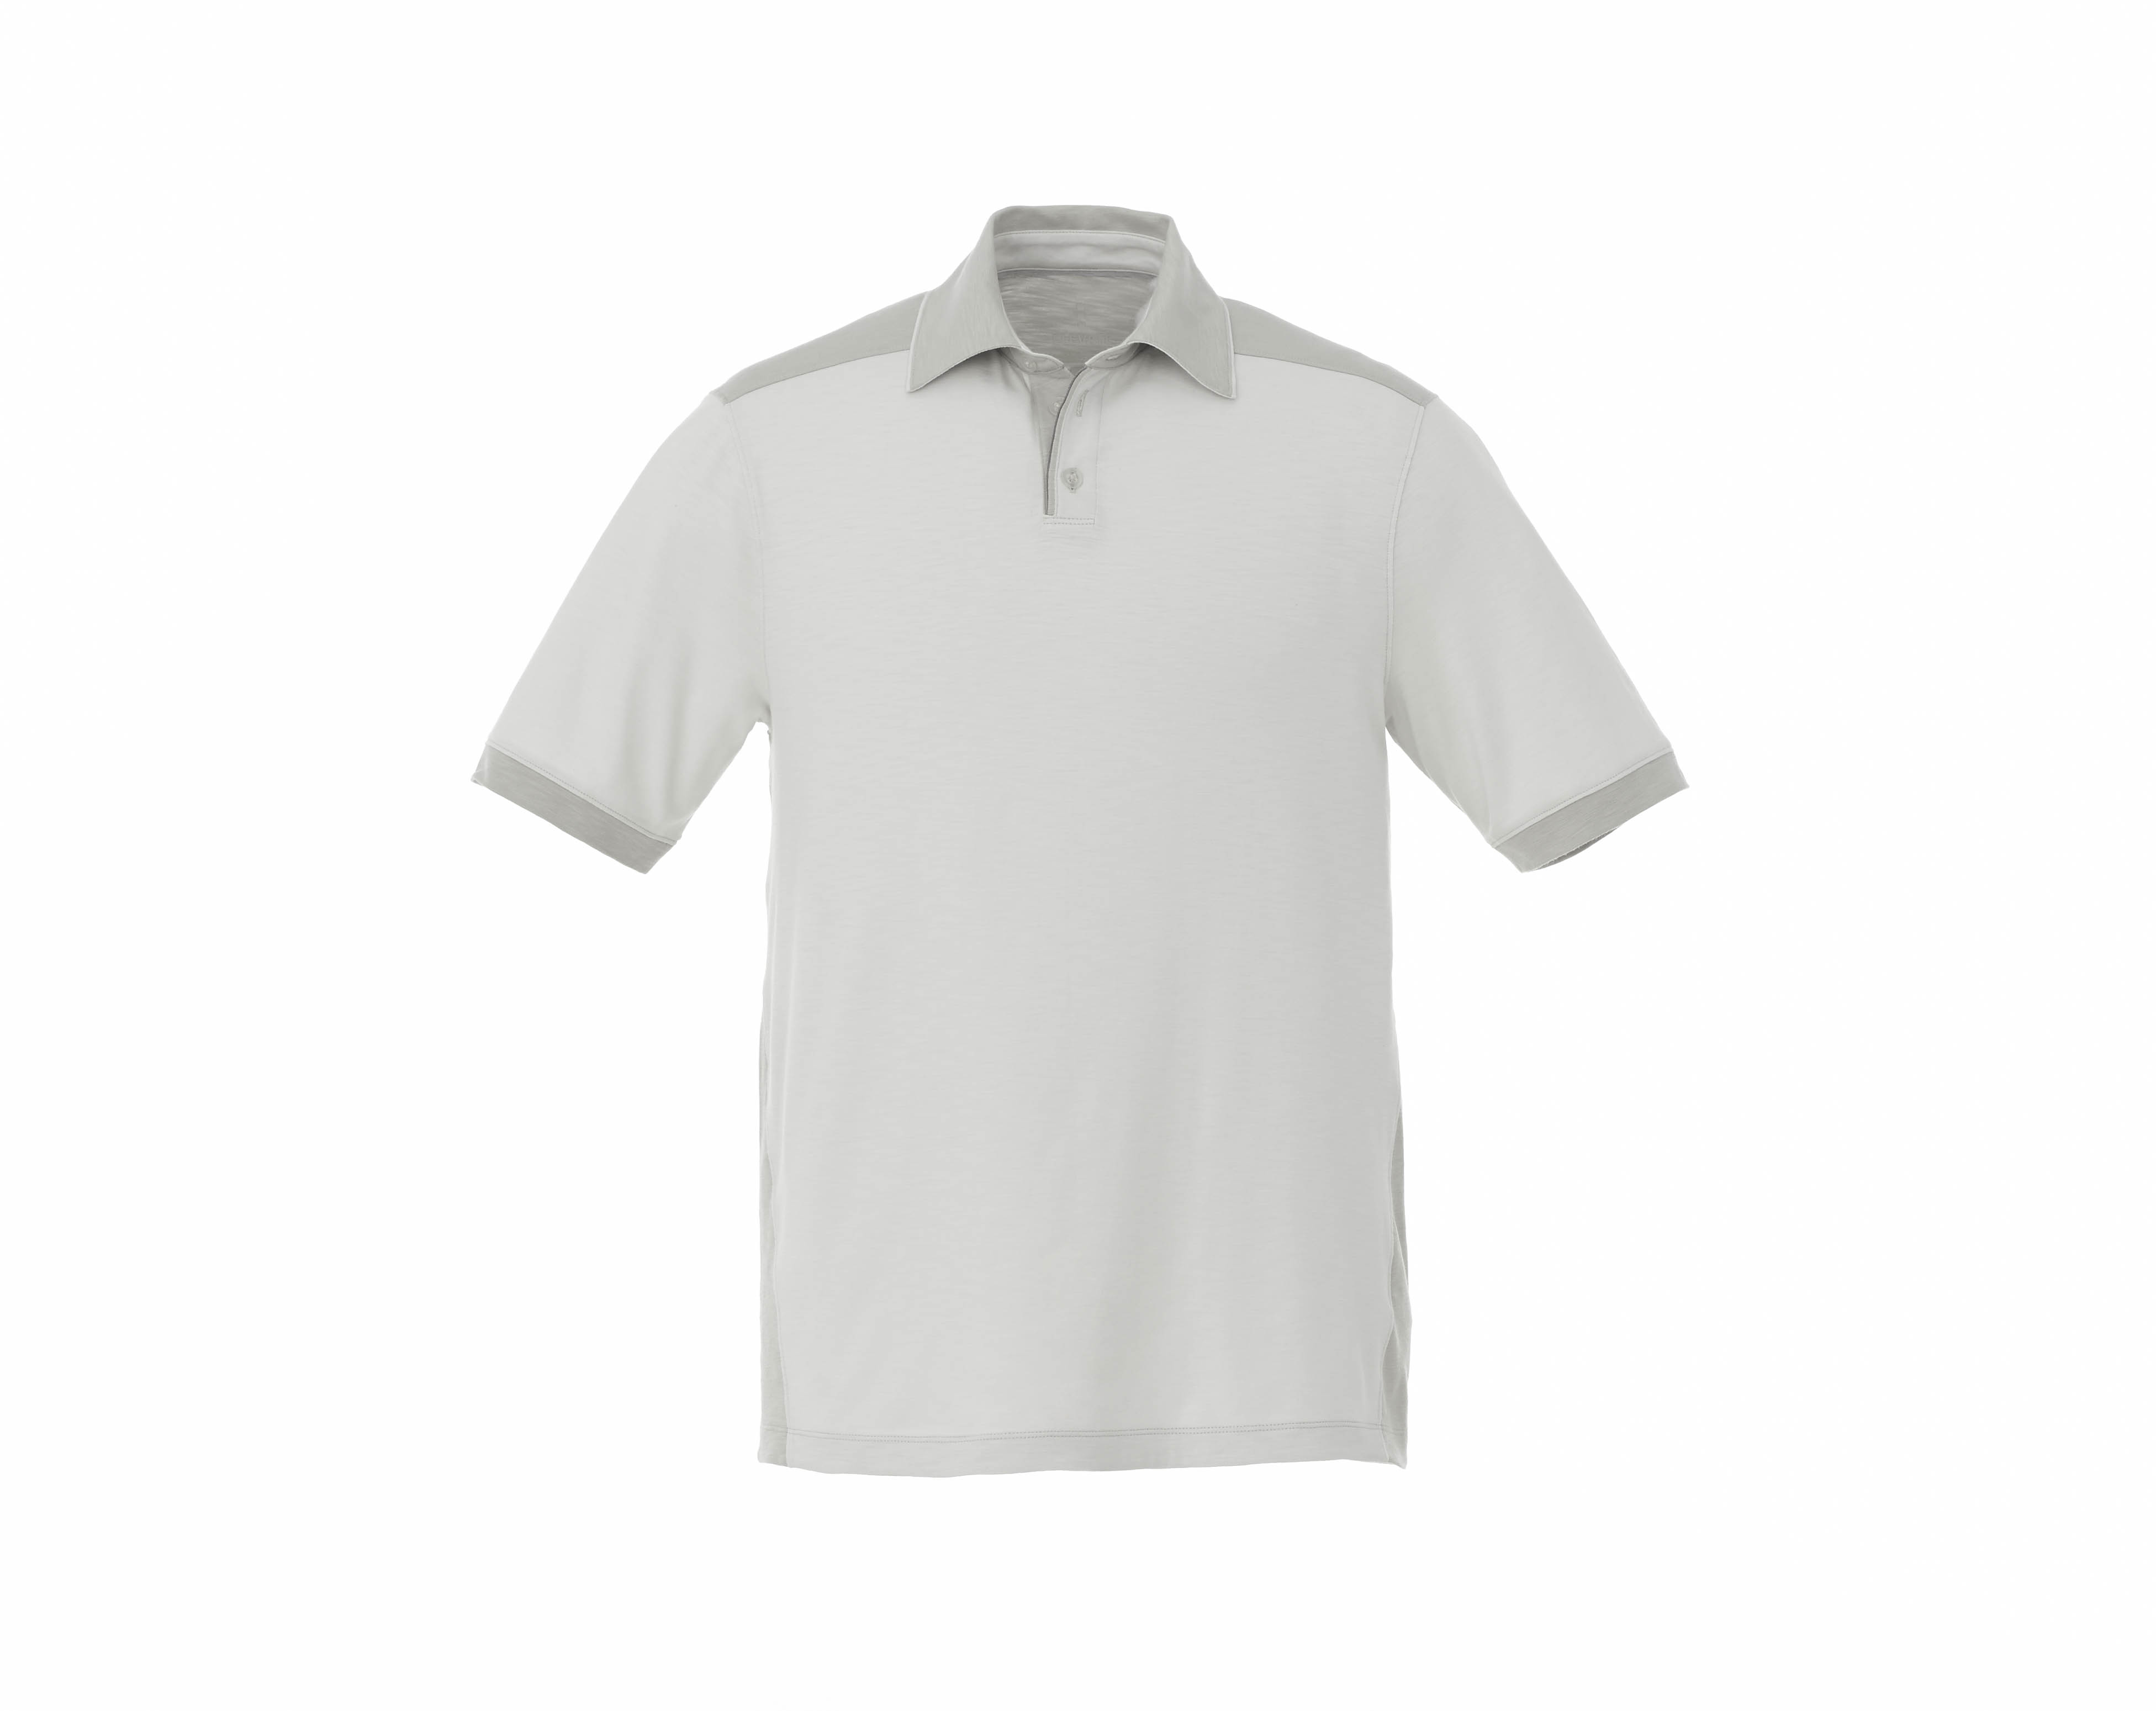 M-LARAMIE Short Sleeve Polo